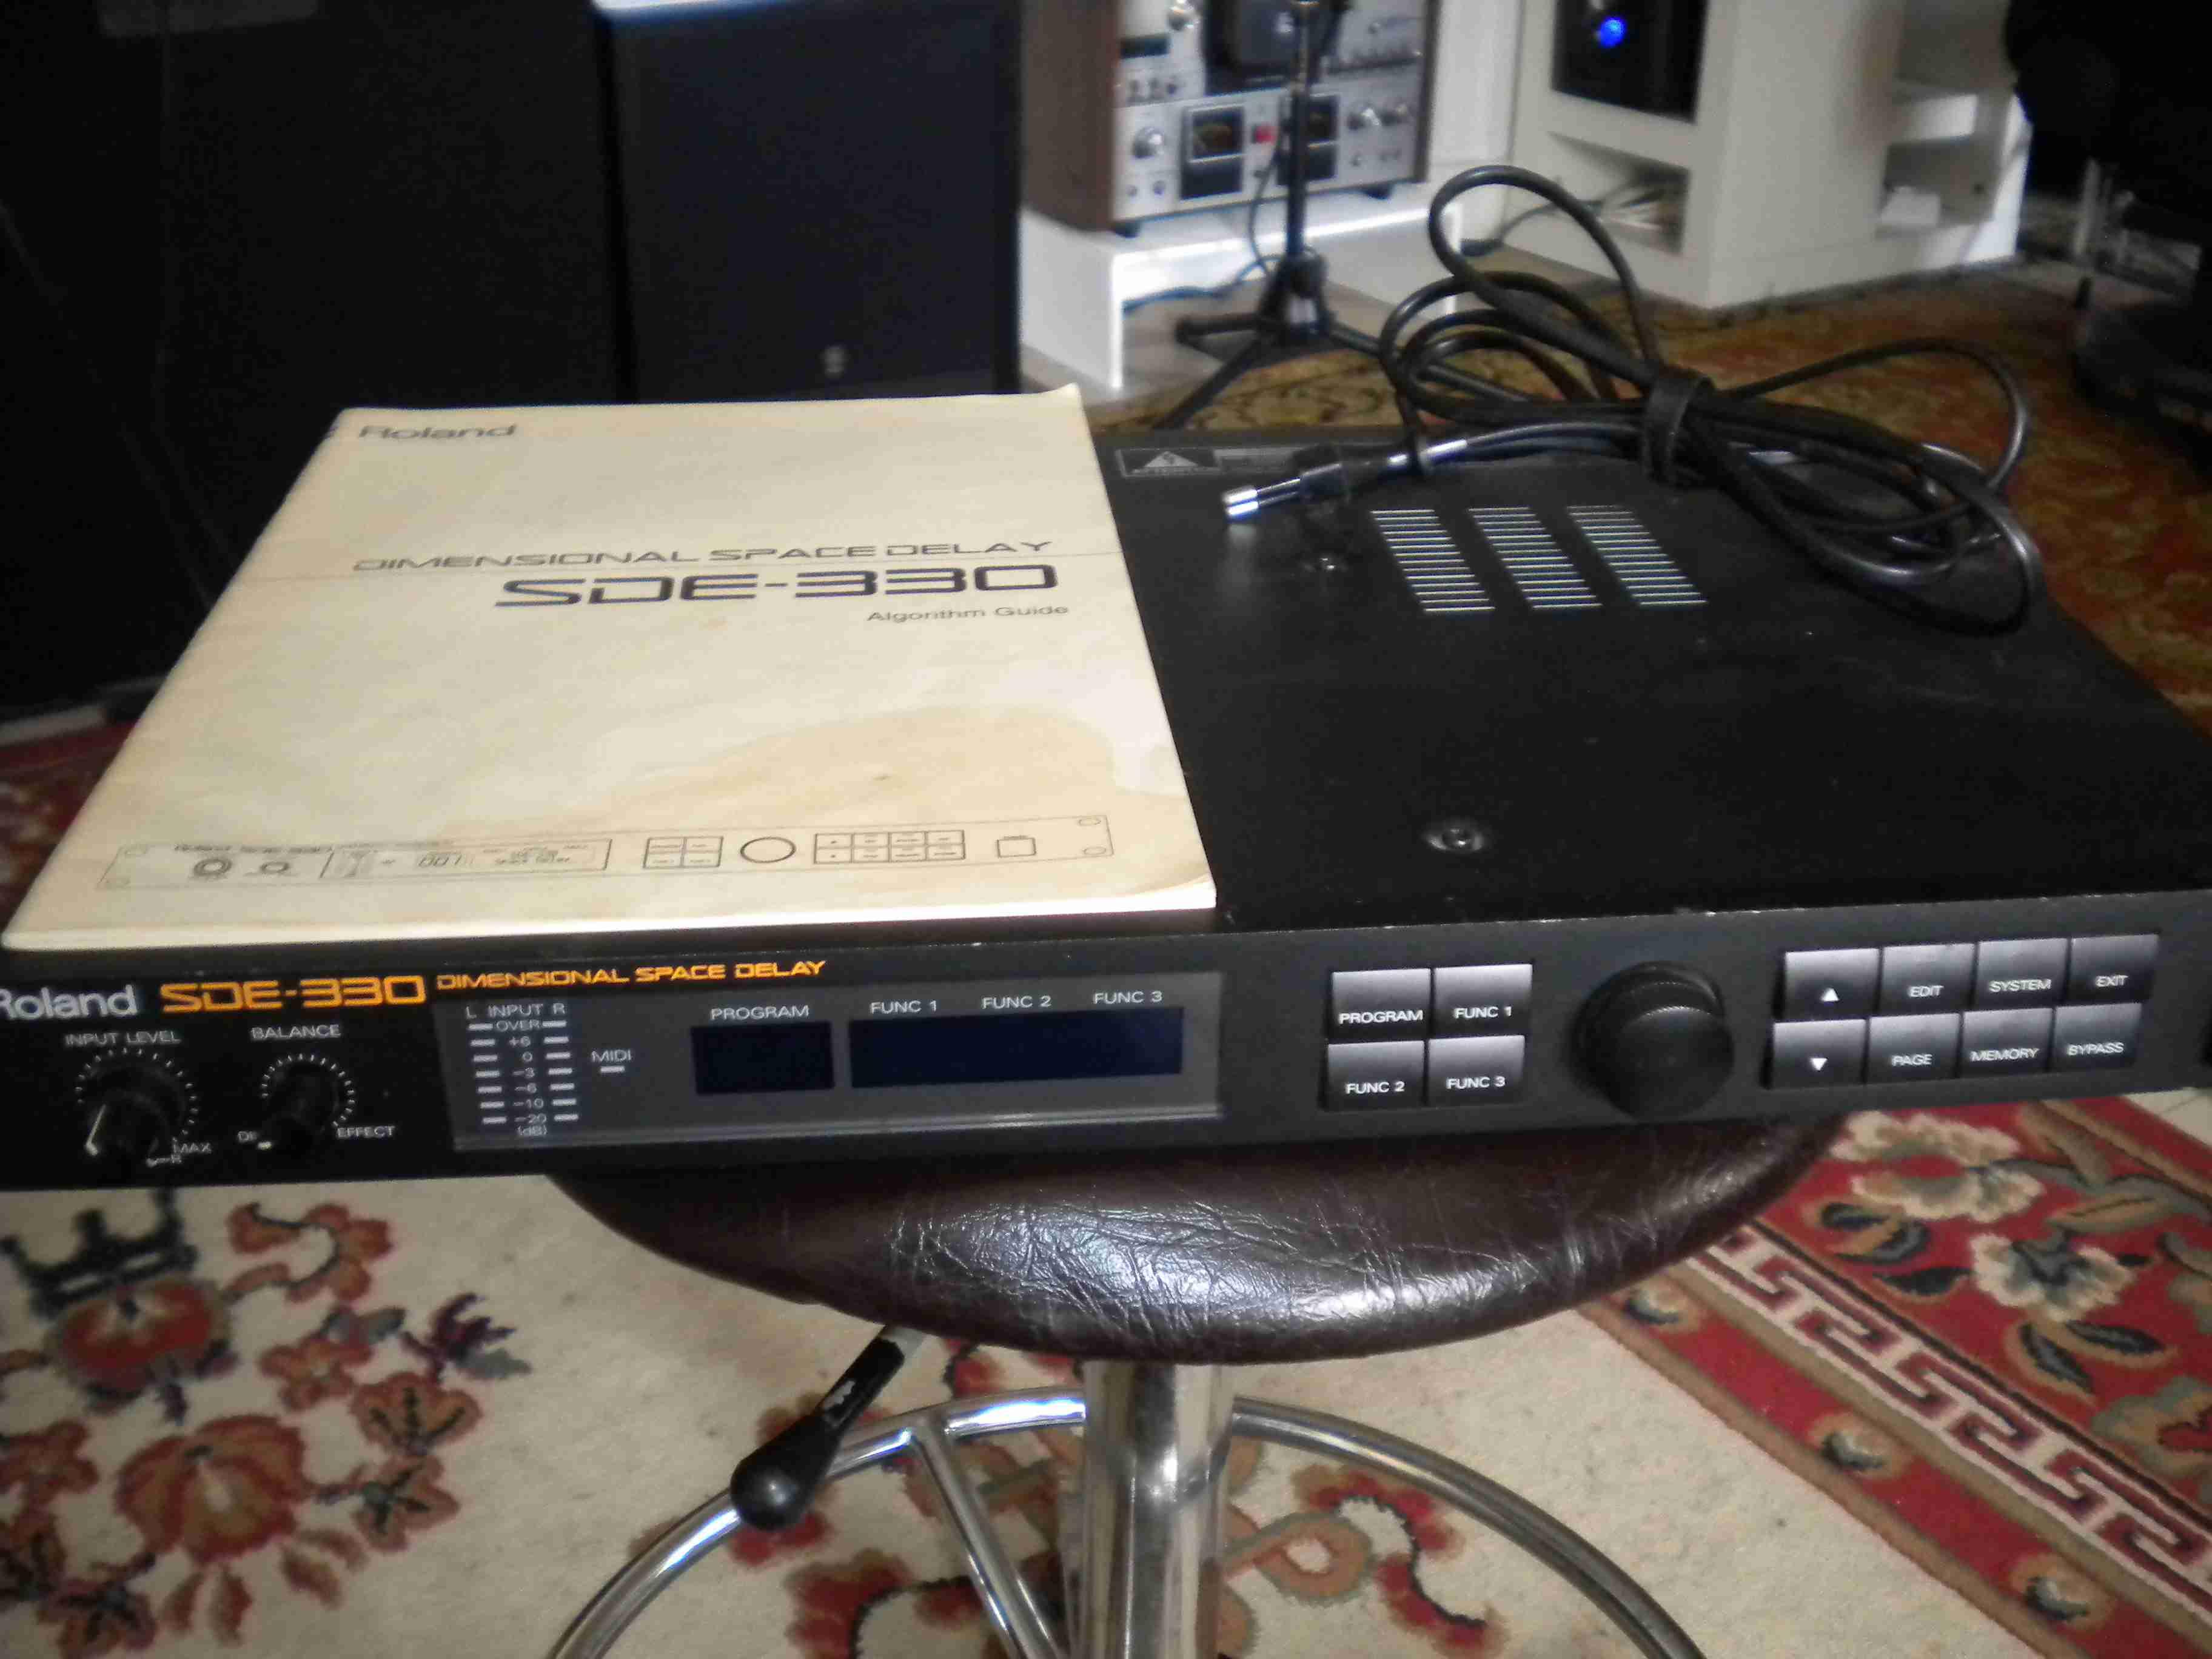 roland sde 330 image 119467 audiofanzine rh en audiofanzine com Roland BA-330 Roland BA-330